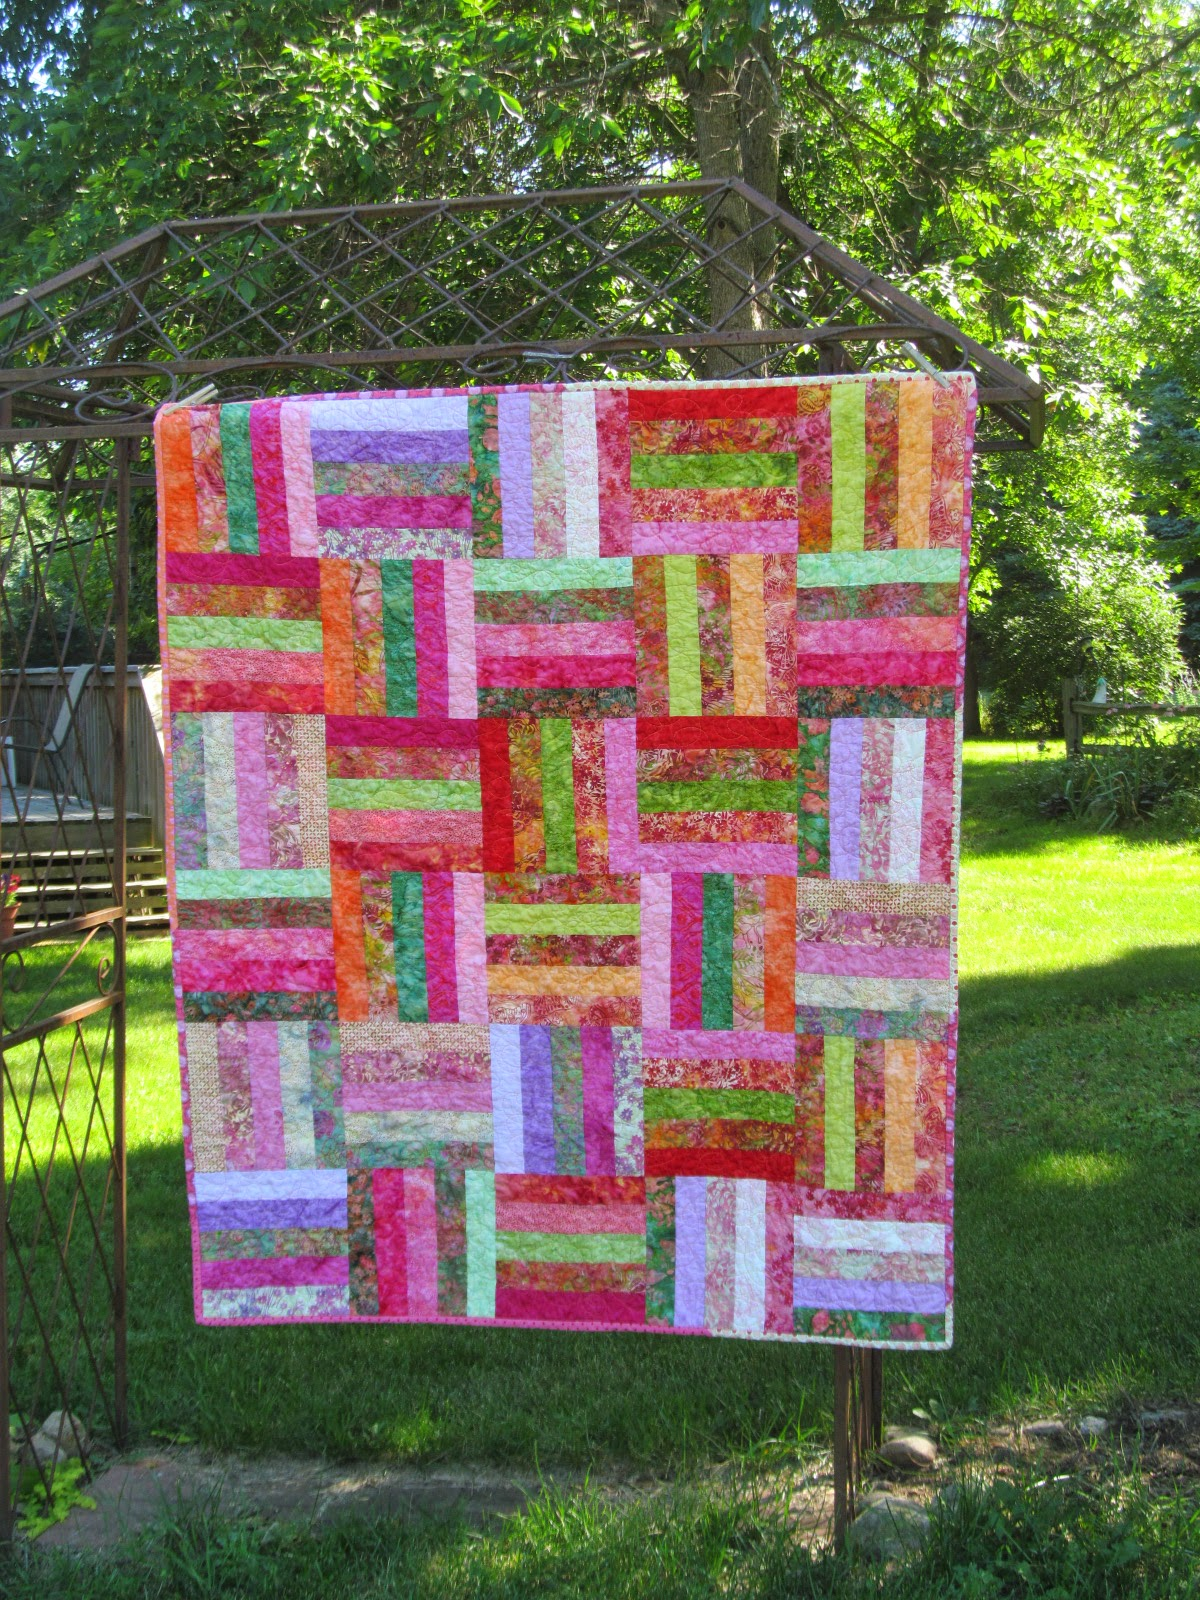 2014 -- My Favorite Quilt